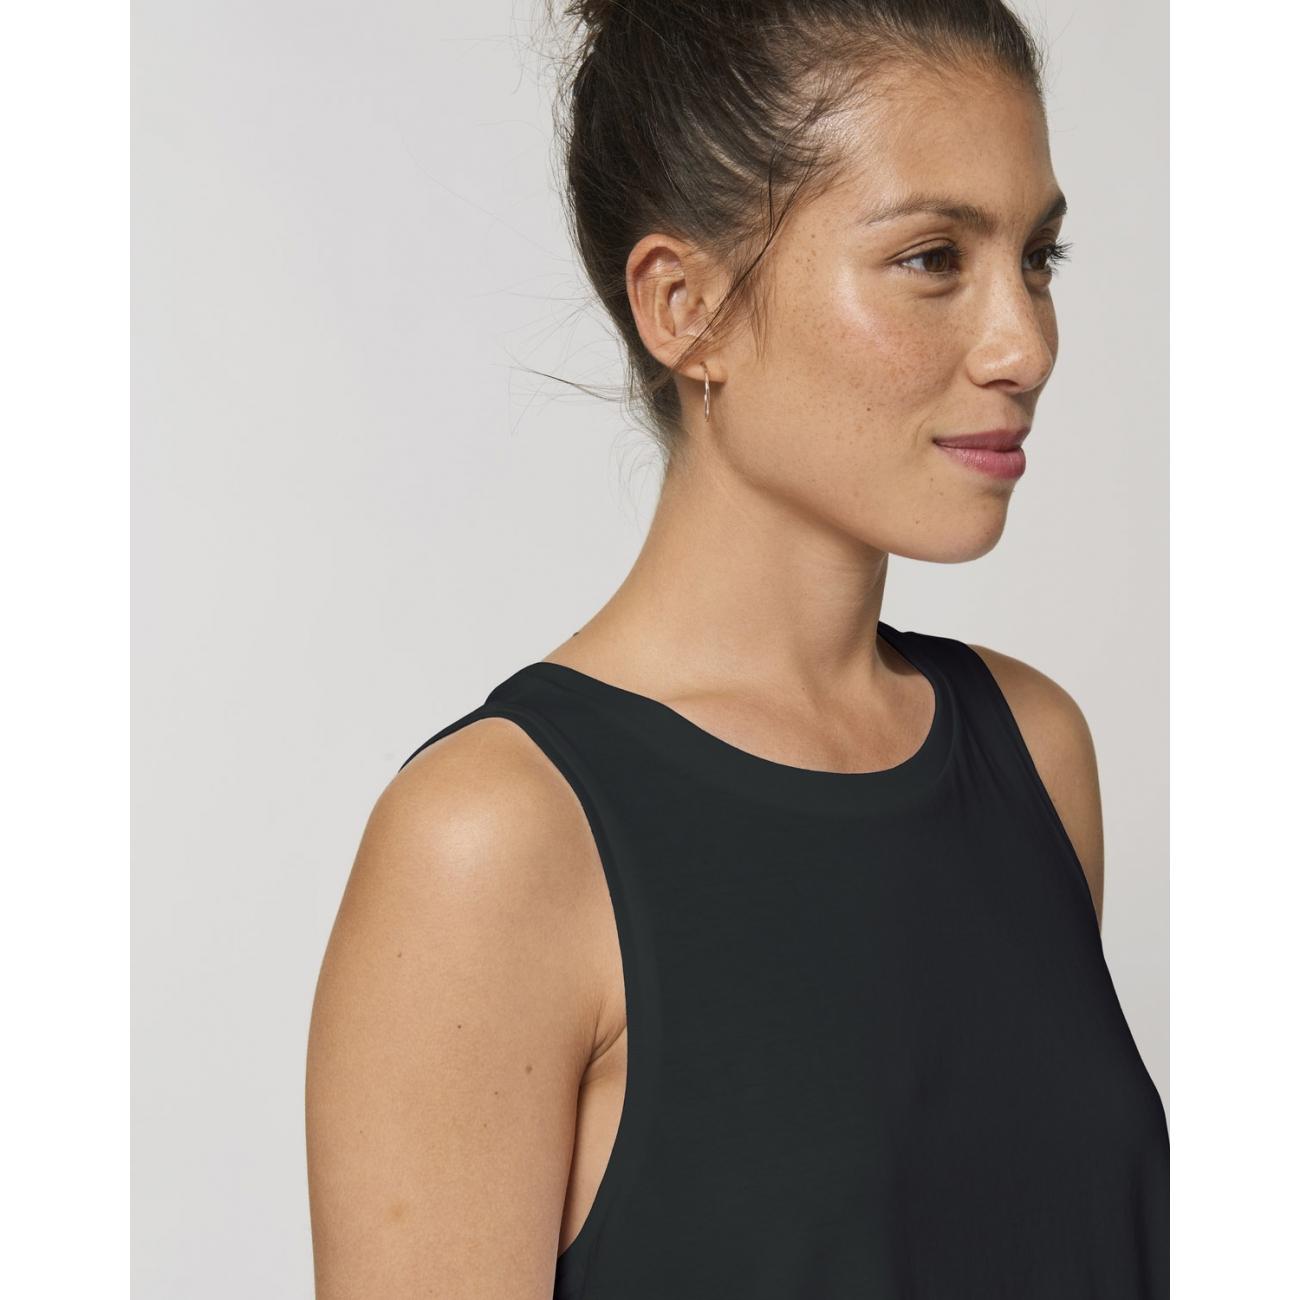 https://tee-shirt-bio.com/8750-thickbox_default/debardeur-femme-coton-bio-noir-debardeur-court-dancer.jpg